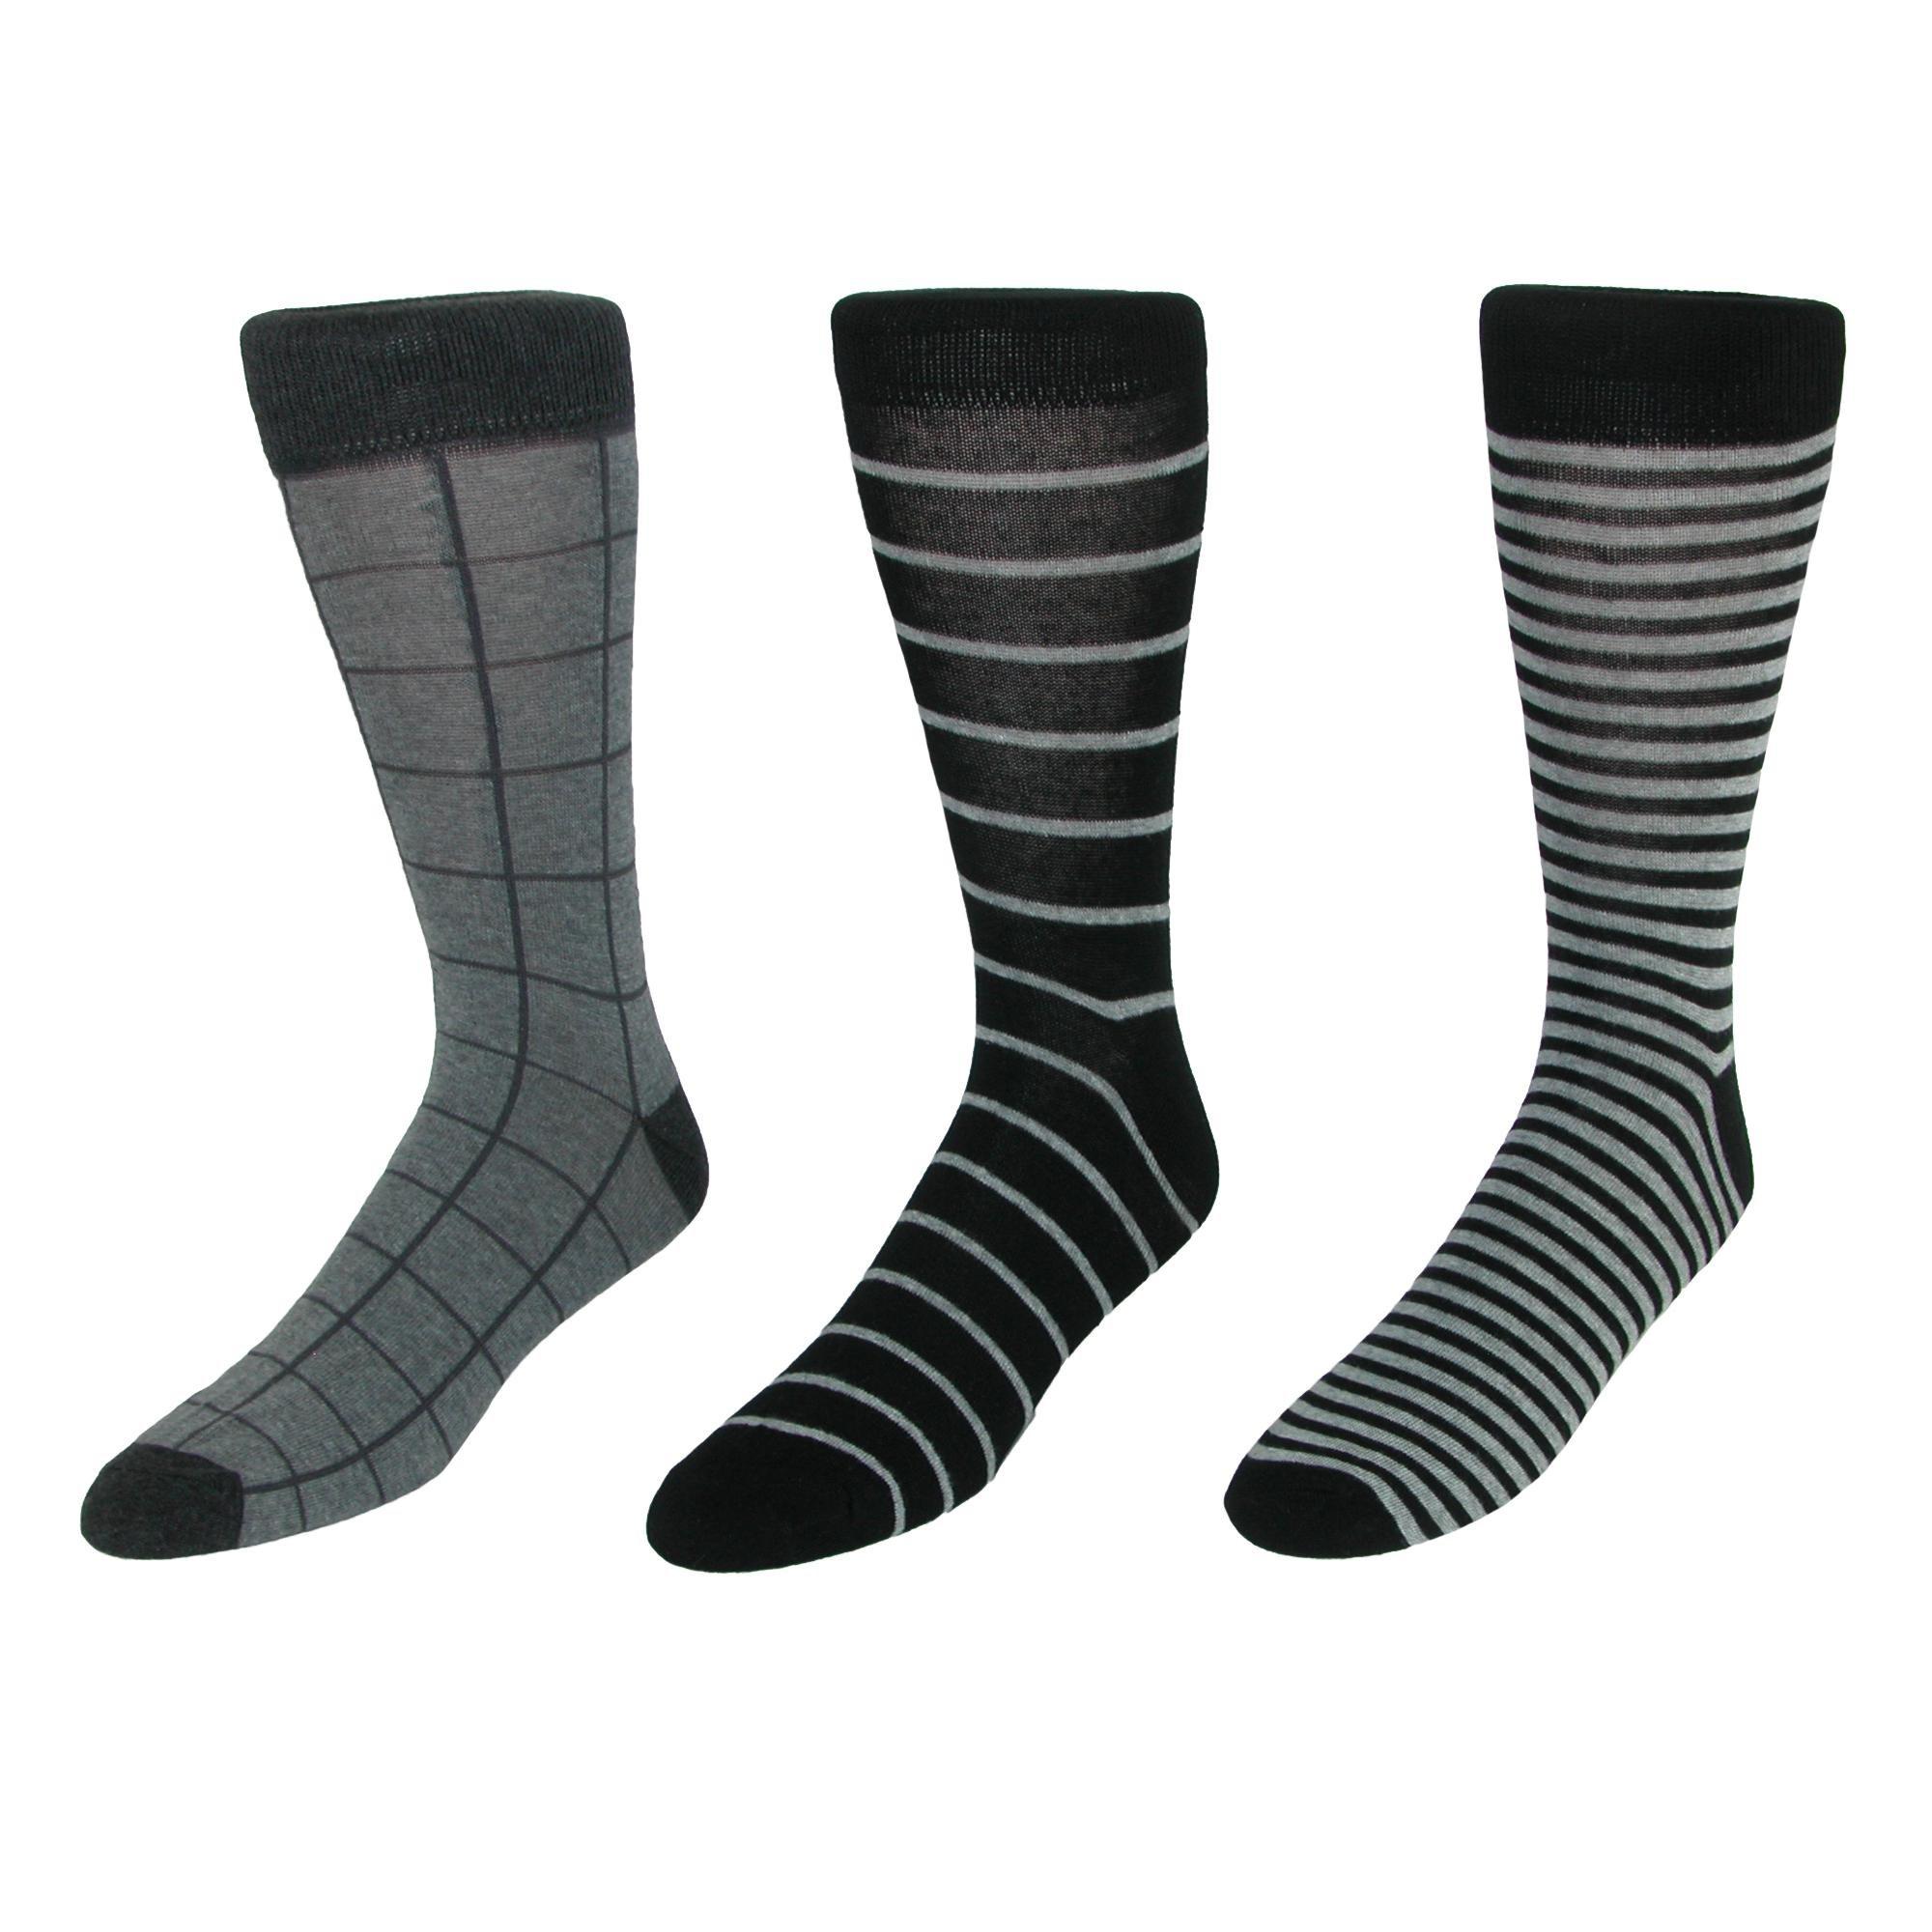 Parquet Men's Dress Sock Gift Box Set (3 Pair Pack), Black Gray